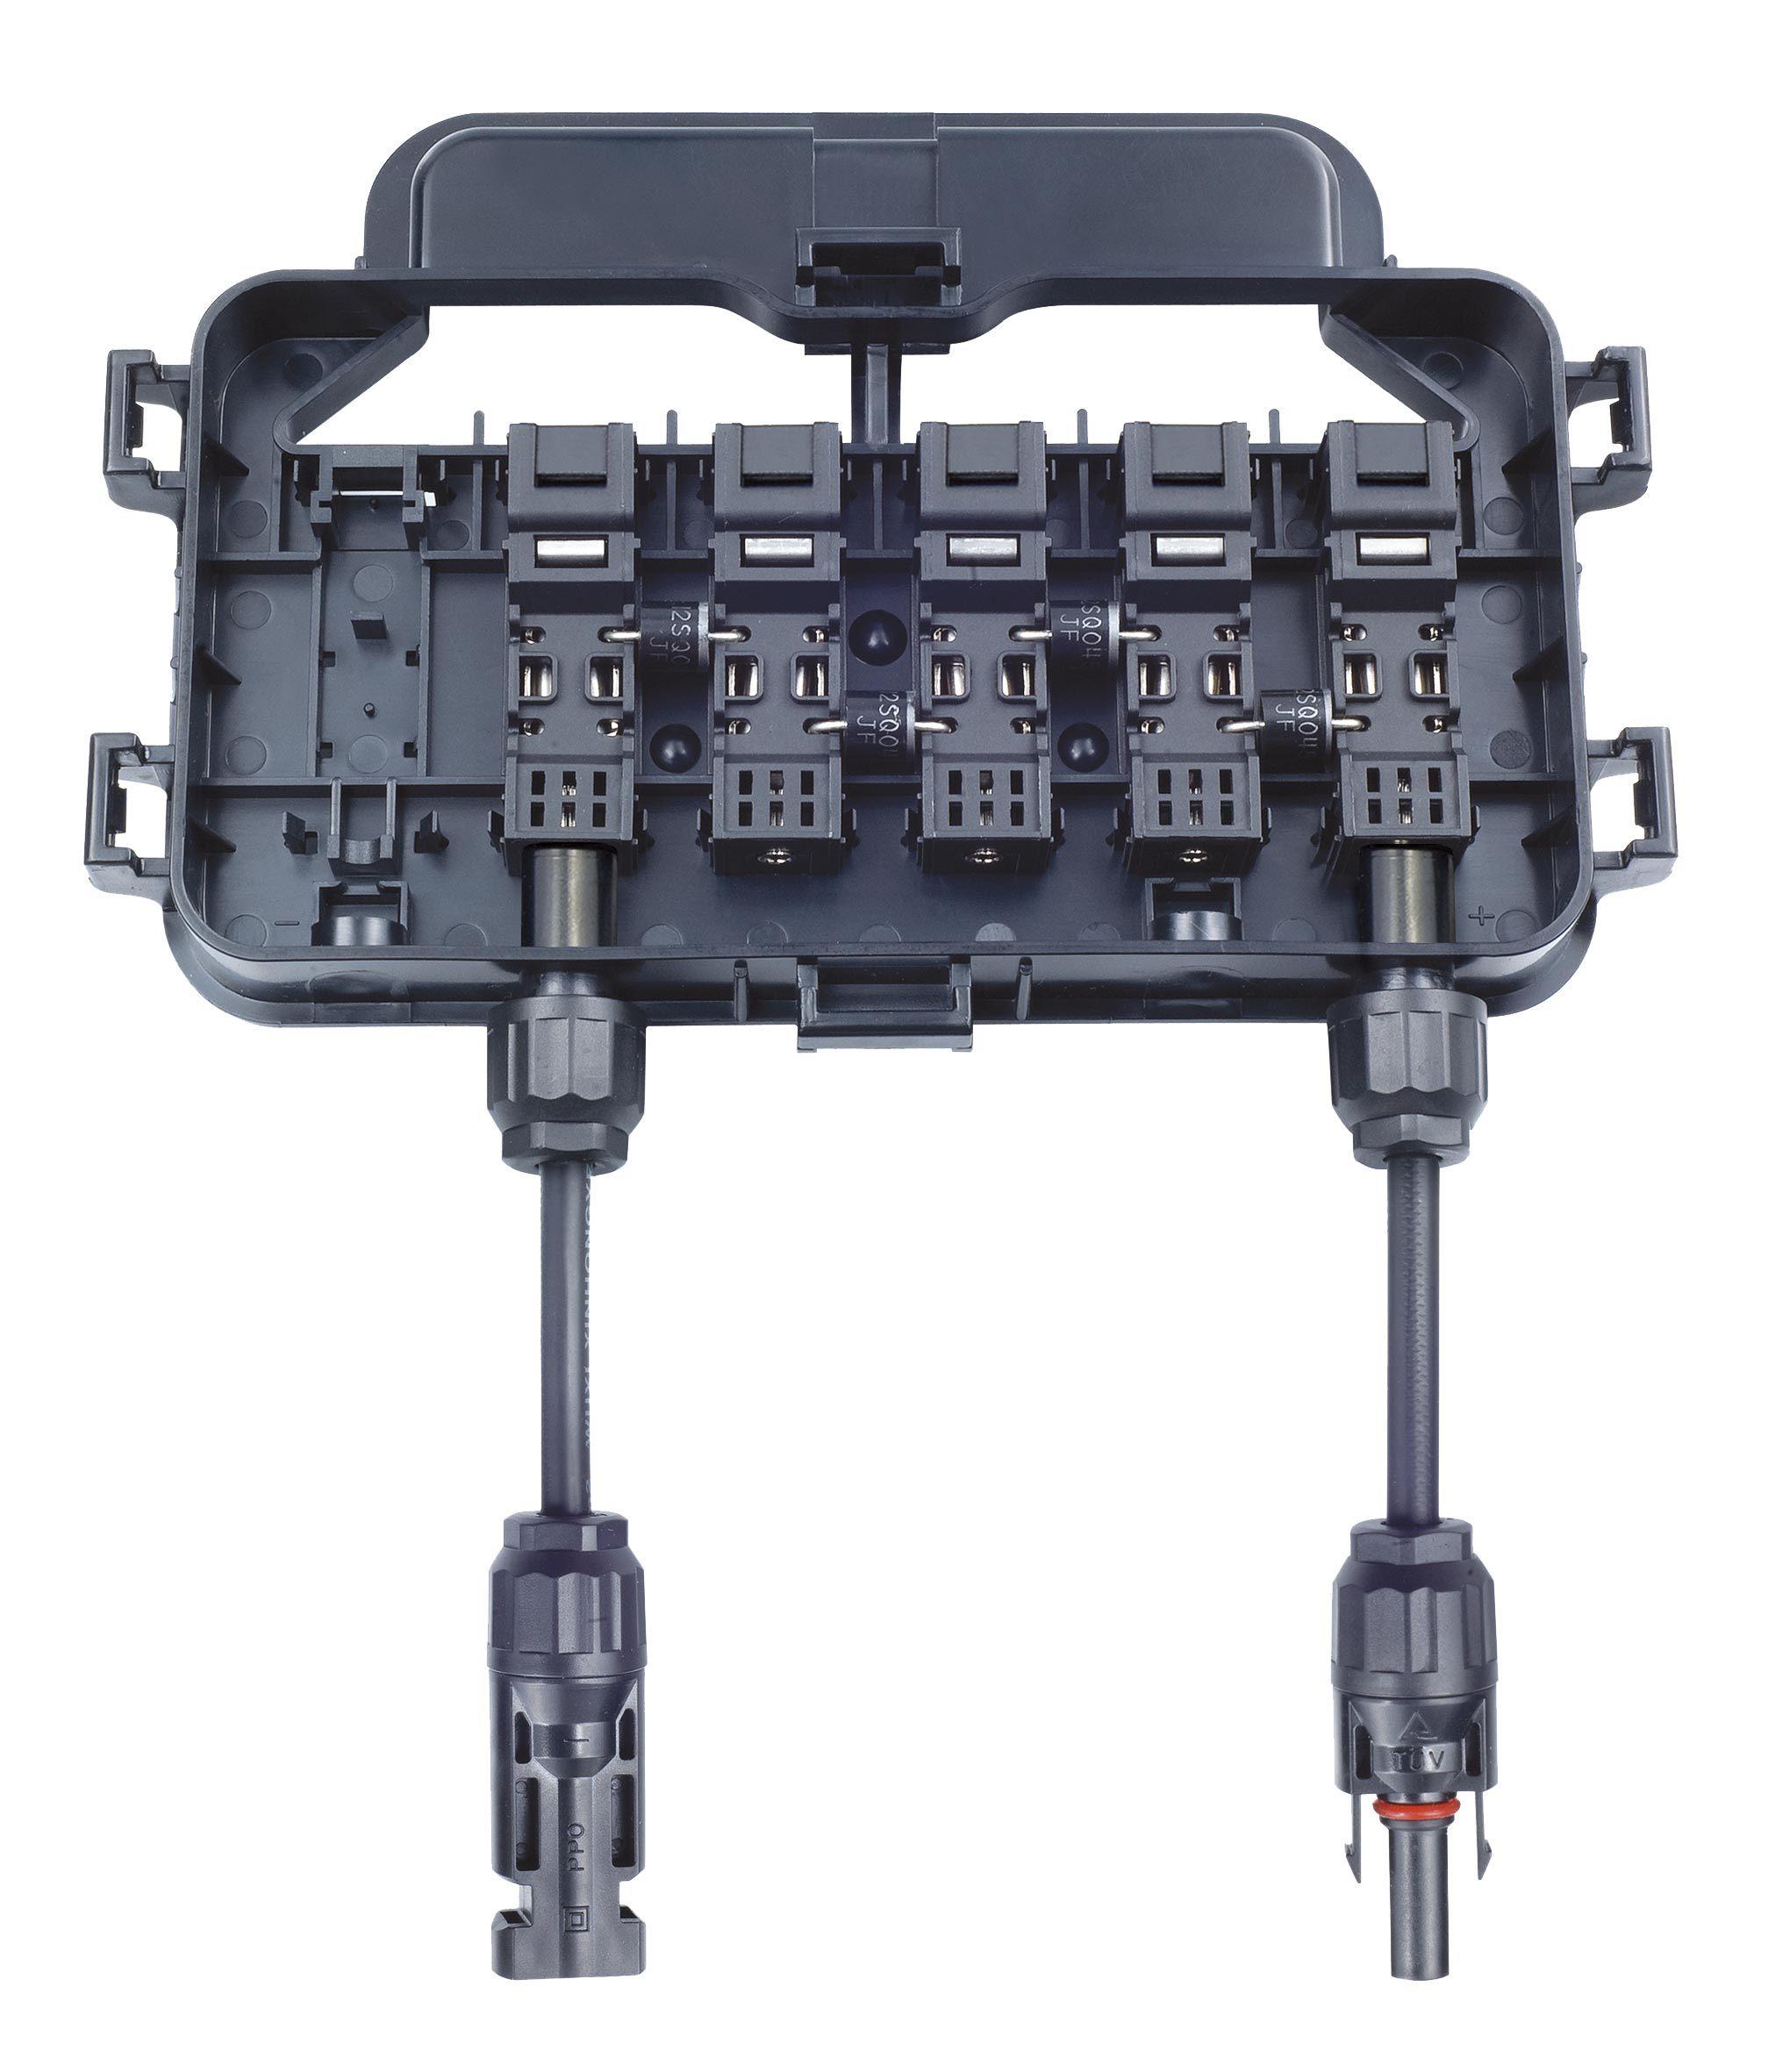 PV-Cy808 (5 terminal) Solar Waterproof PV Solar Moule Panel Junction Box